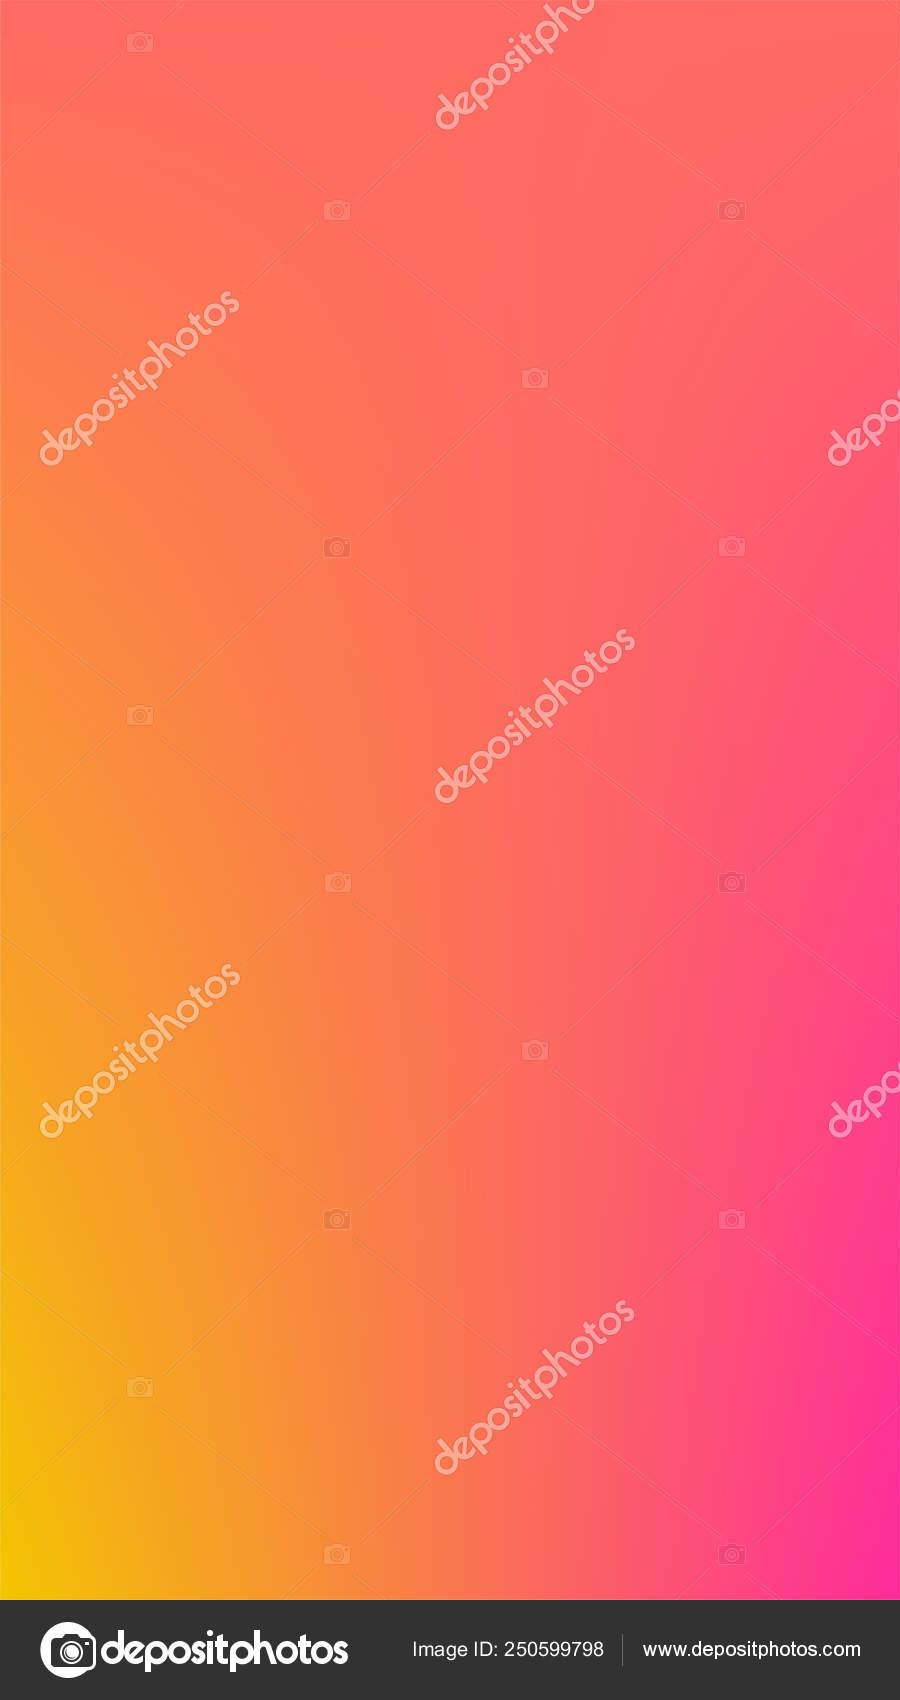 Neon Instagram Templates For Stories Stock Vector C Almazovadolzhenko 250599798